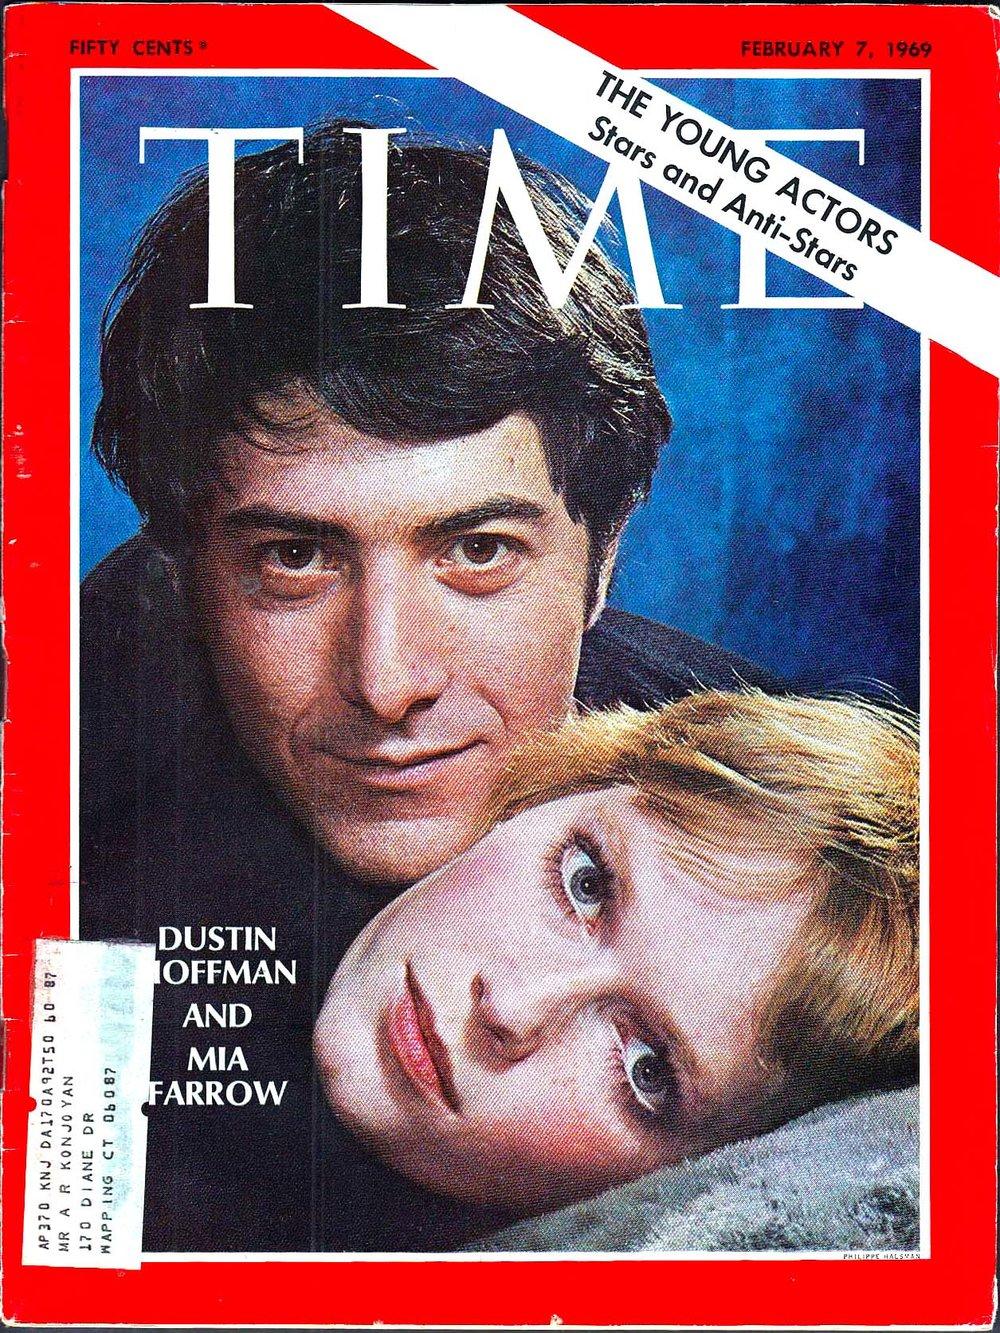 TimeMagazineDecember1969DustinHoffmanMiaFarrow.jpg